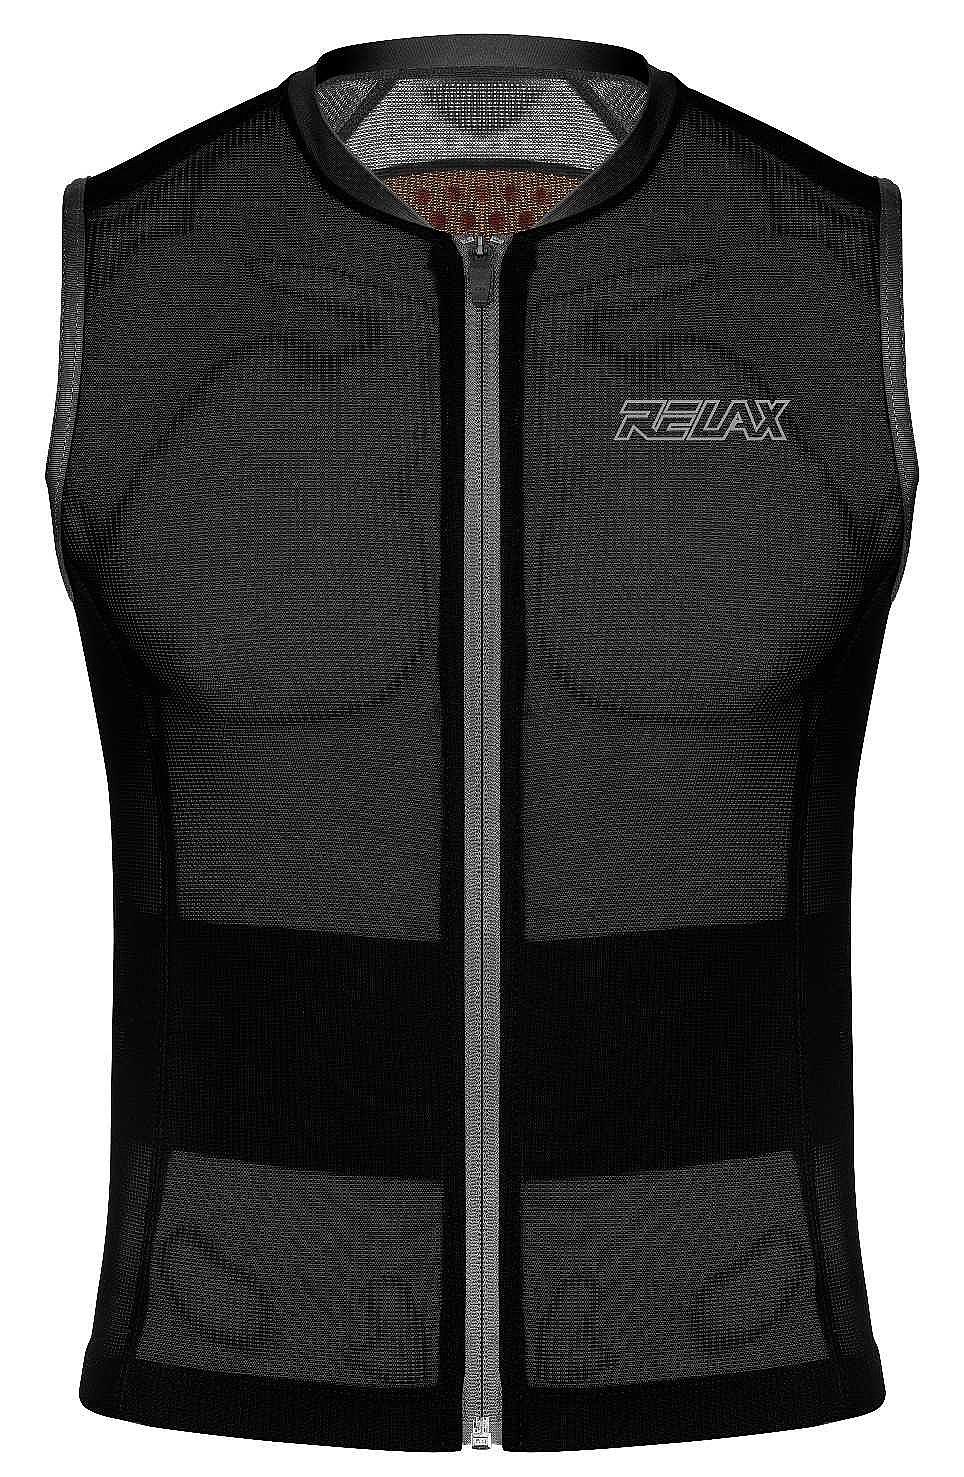 porotector Relax Speedmaster – ROP01A/Black/Gray